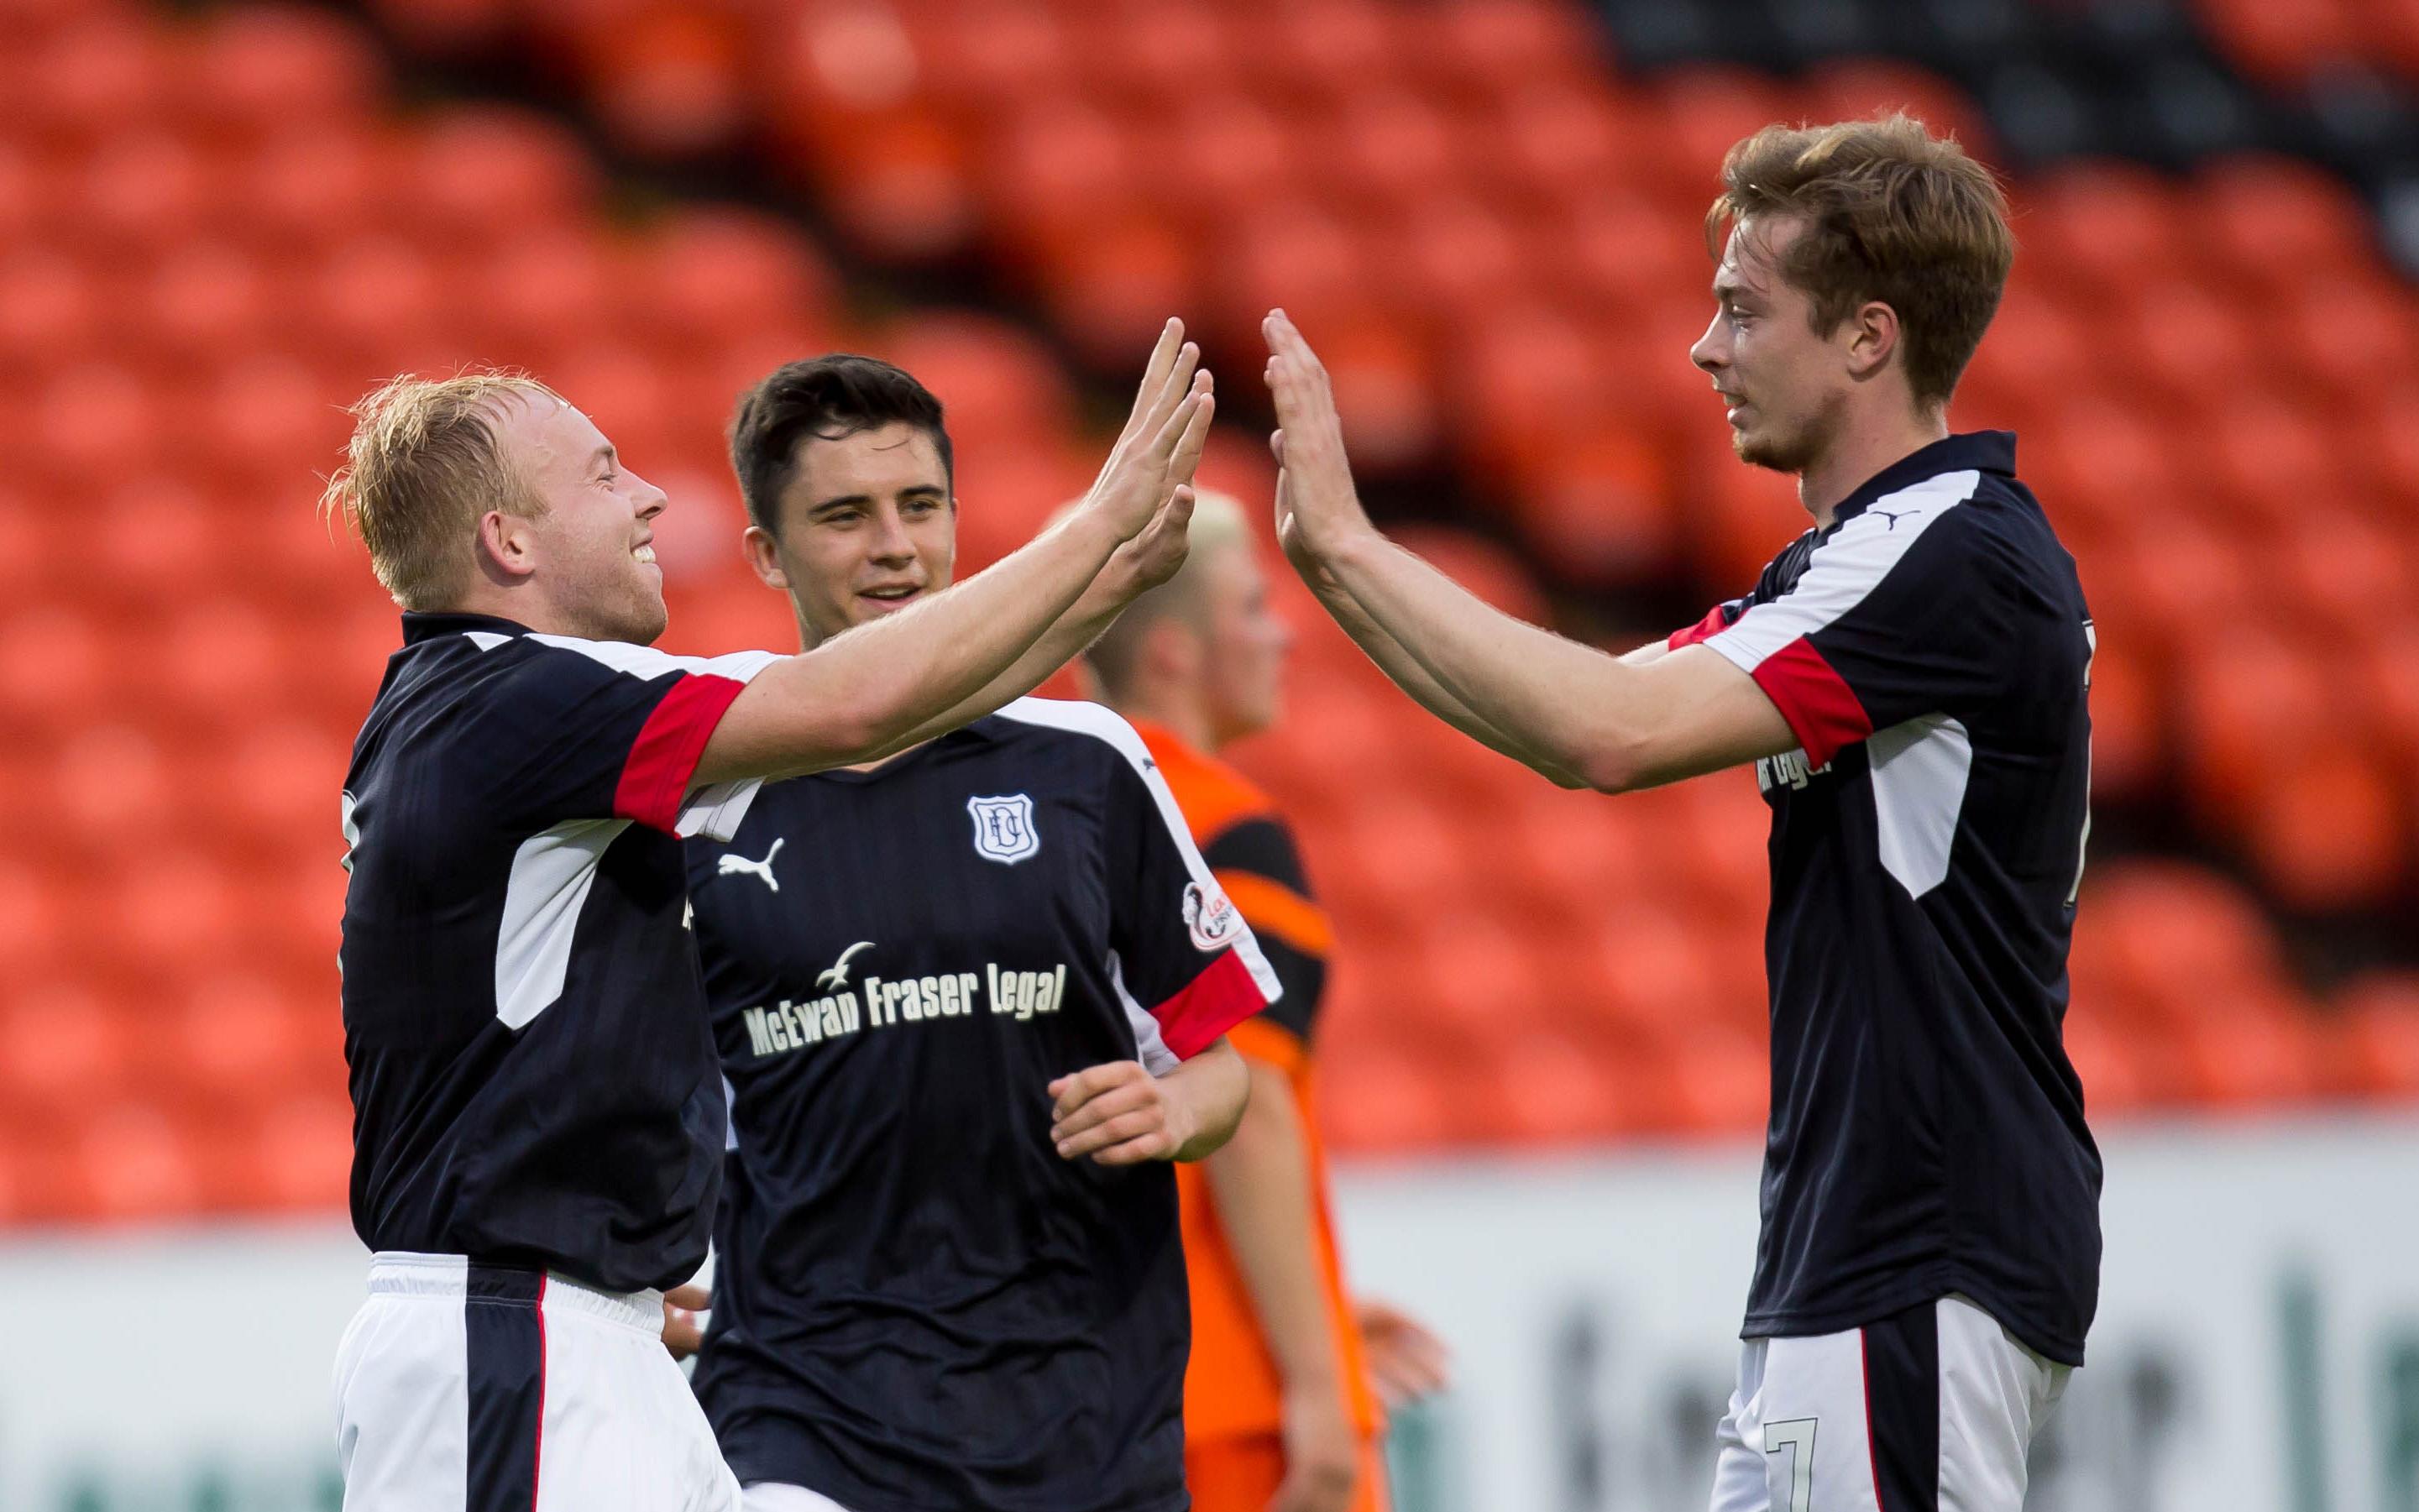 [Image: 06-09-2016-Dundee-United-v-Dundee-20s-0602.jpg]